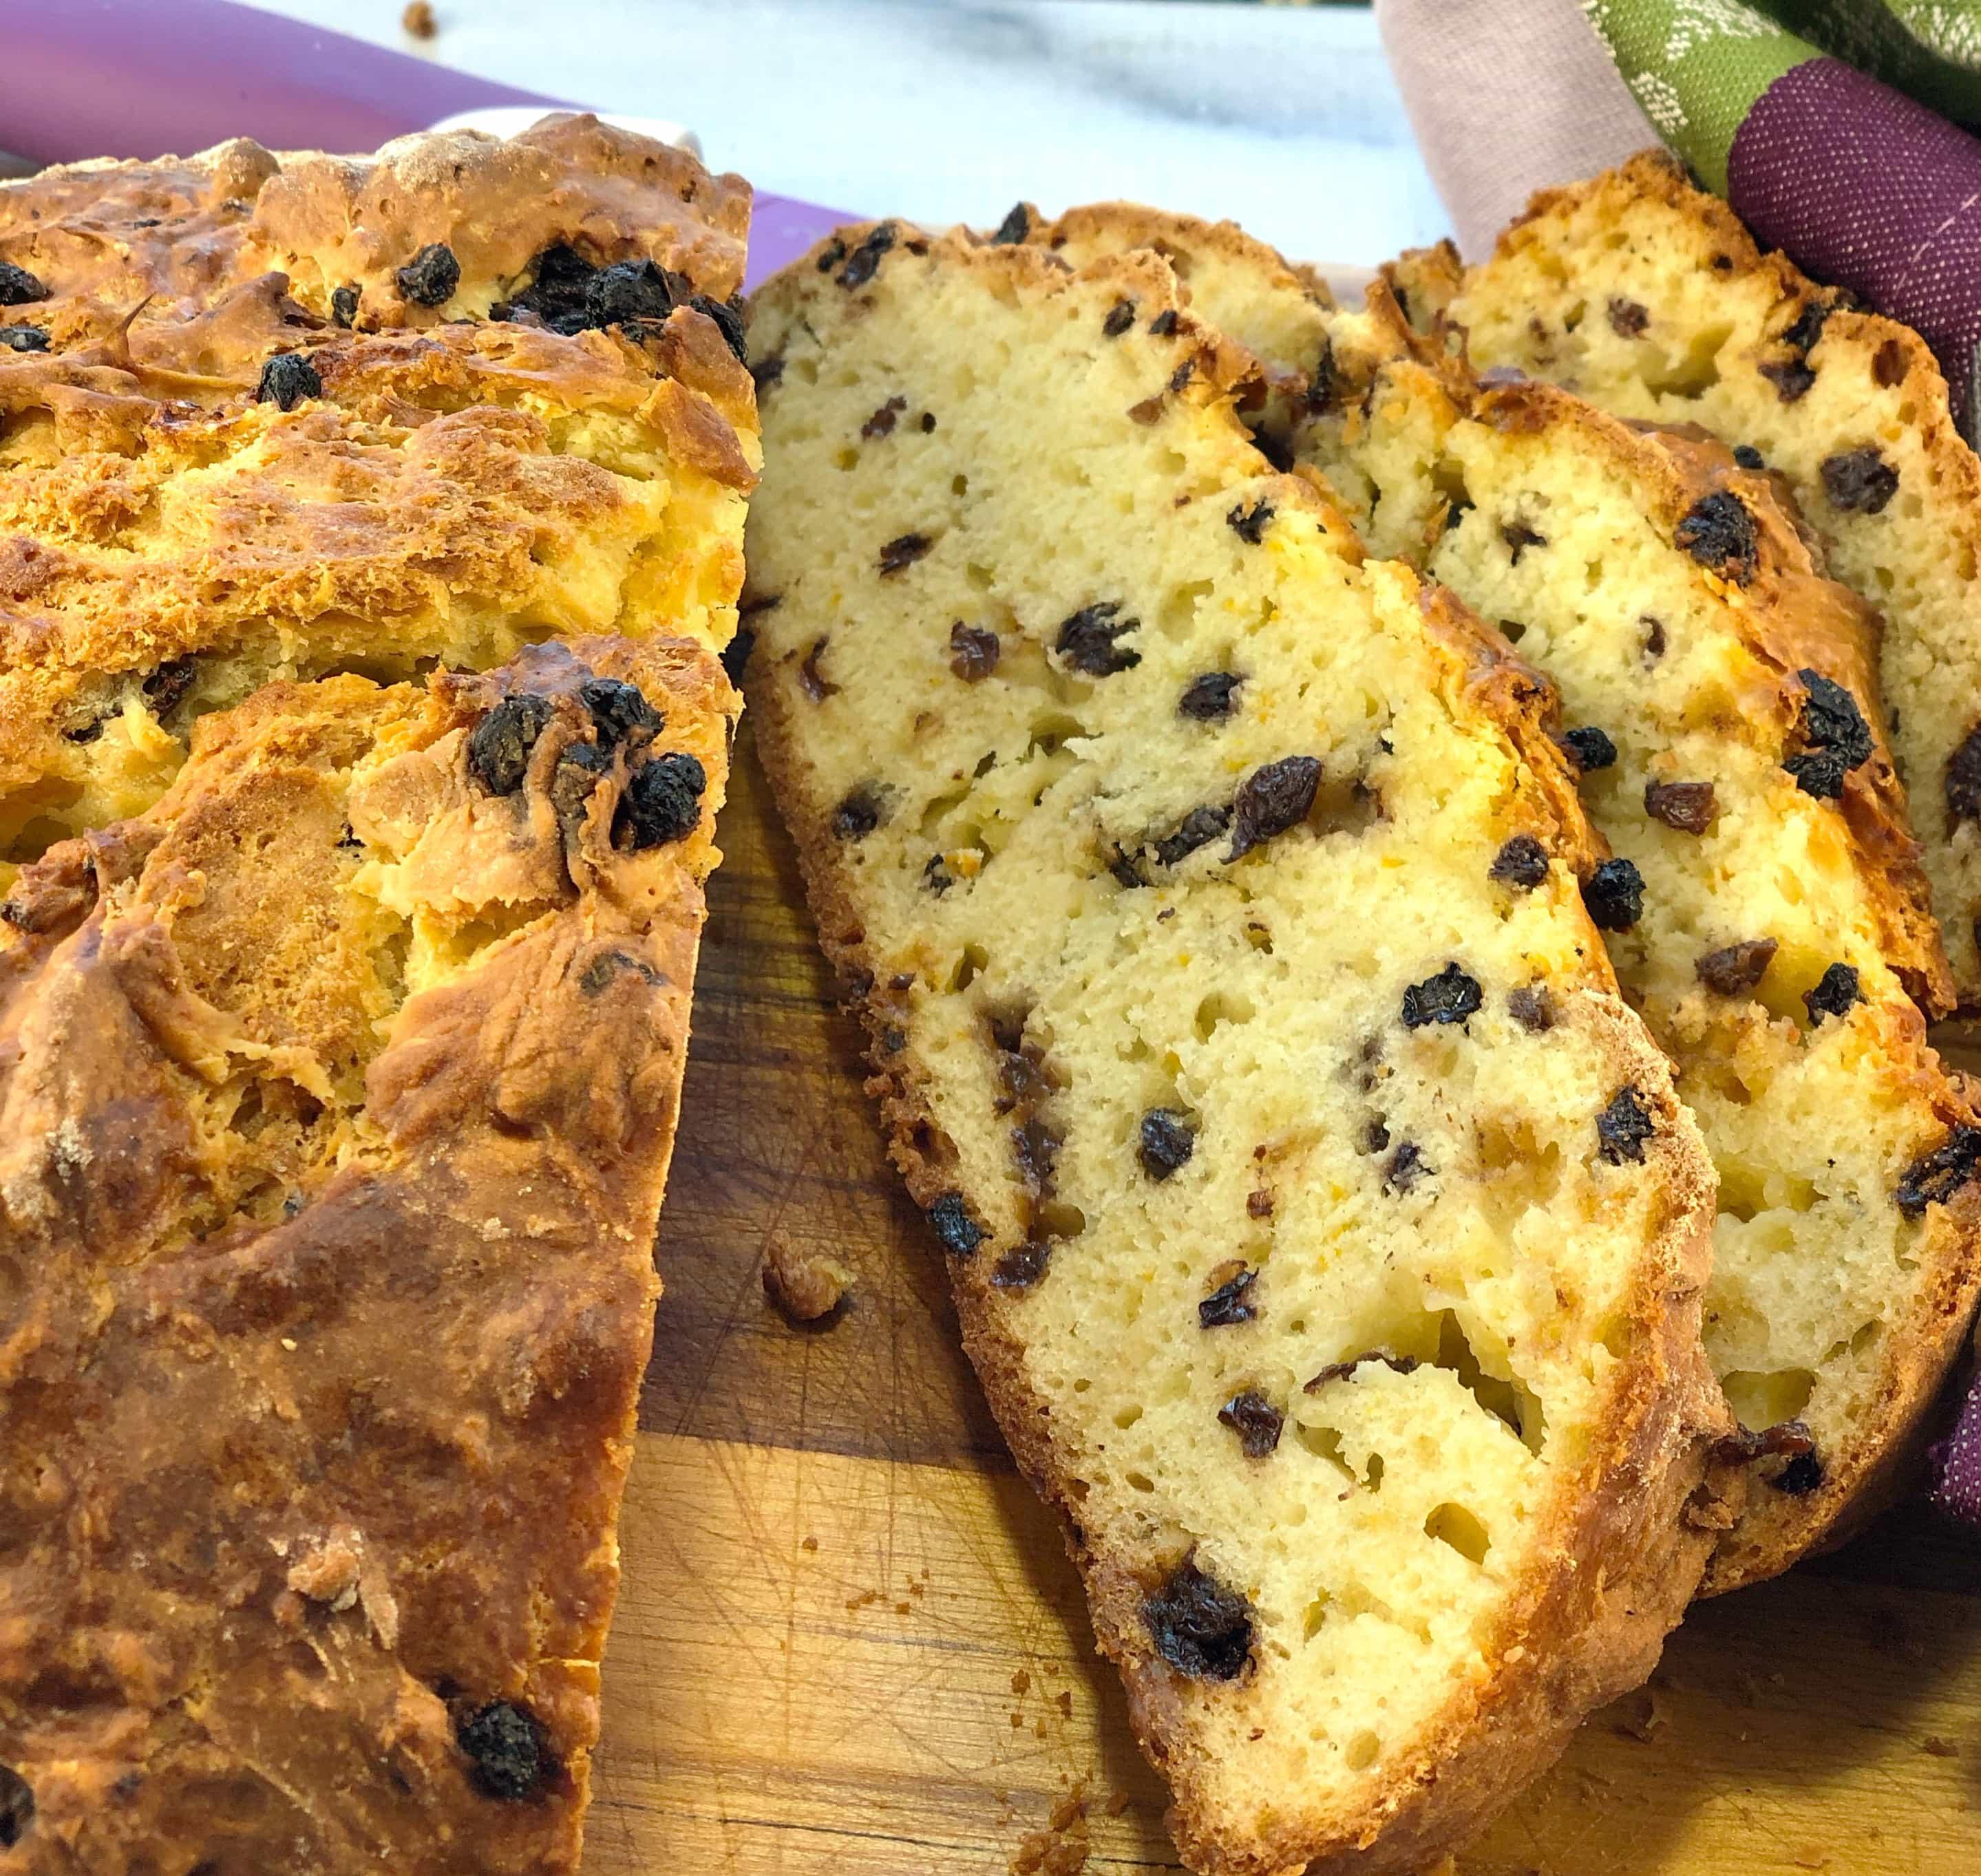 Ina Garten's Soda Bread